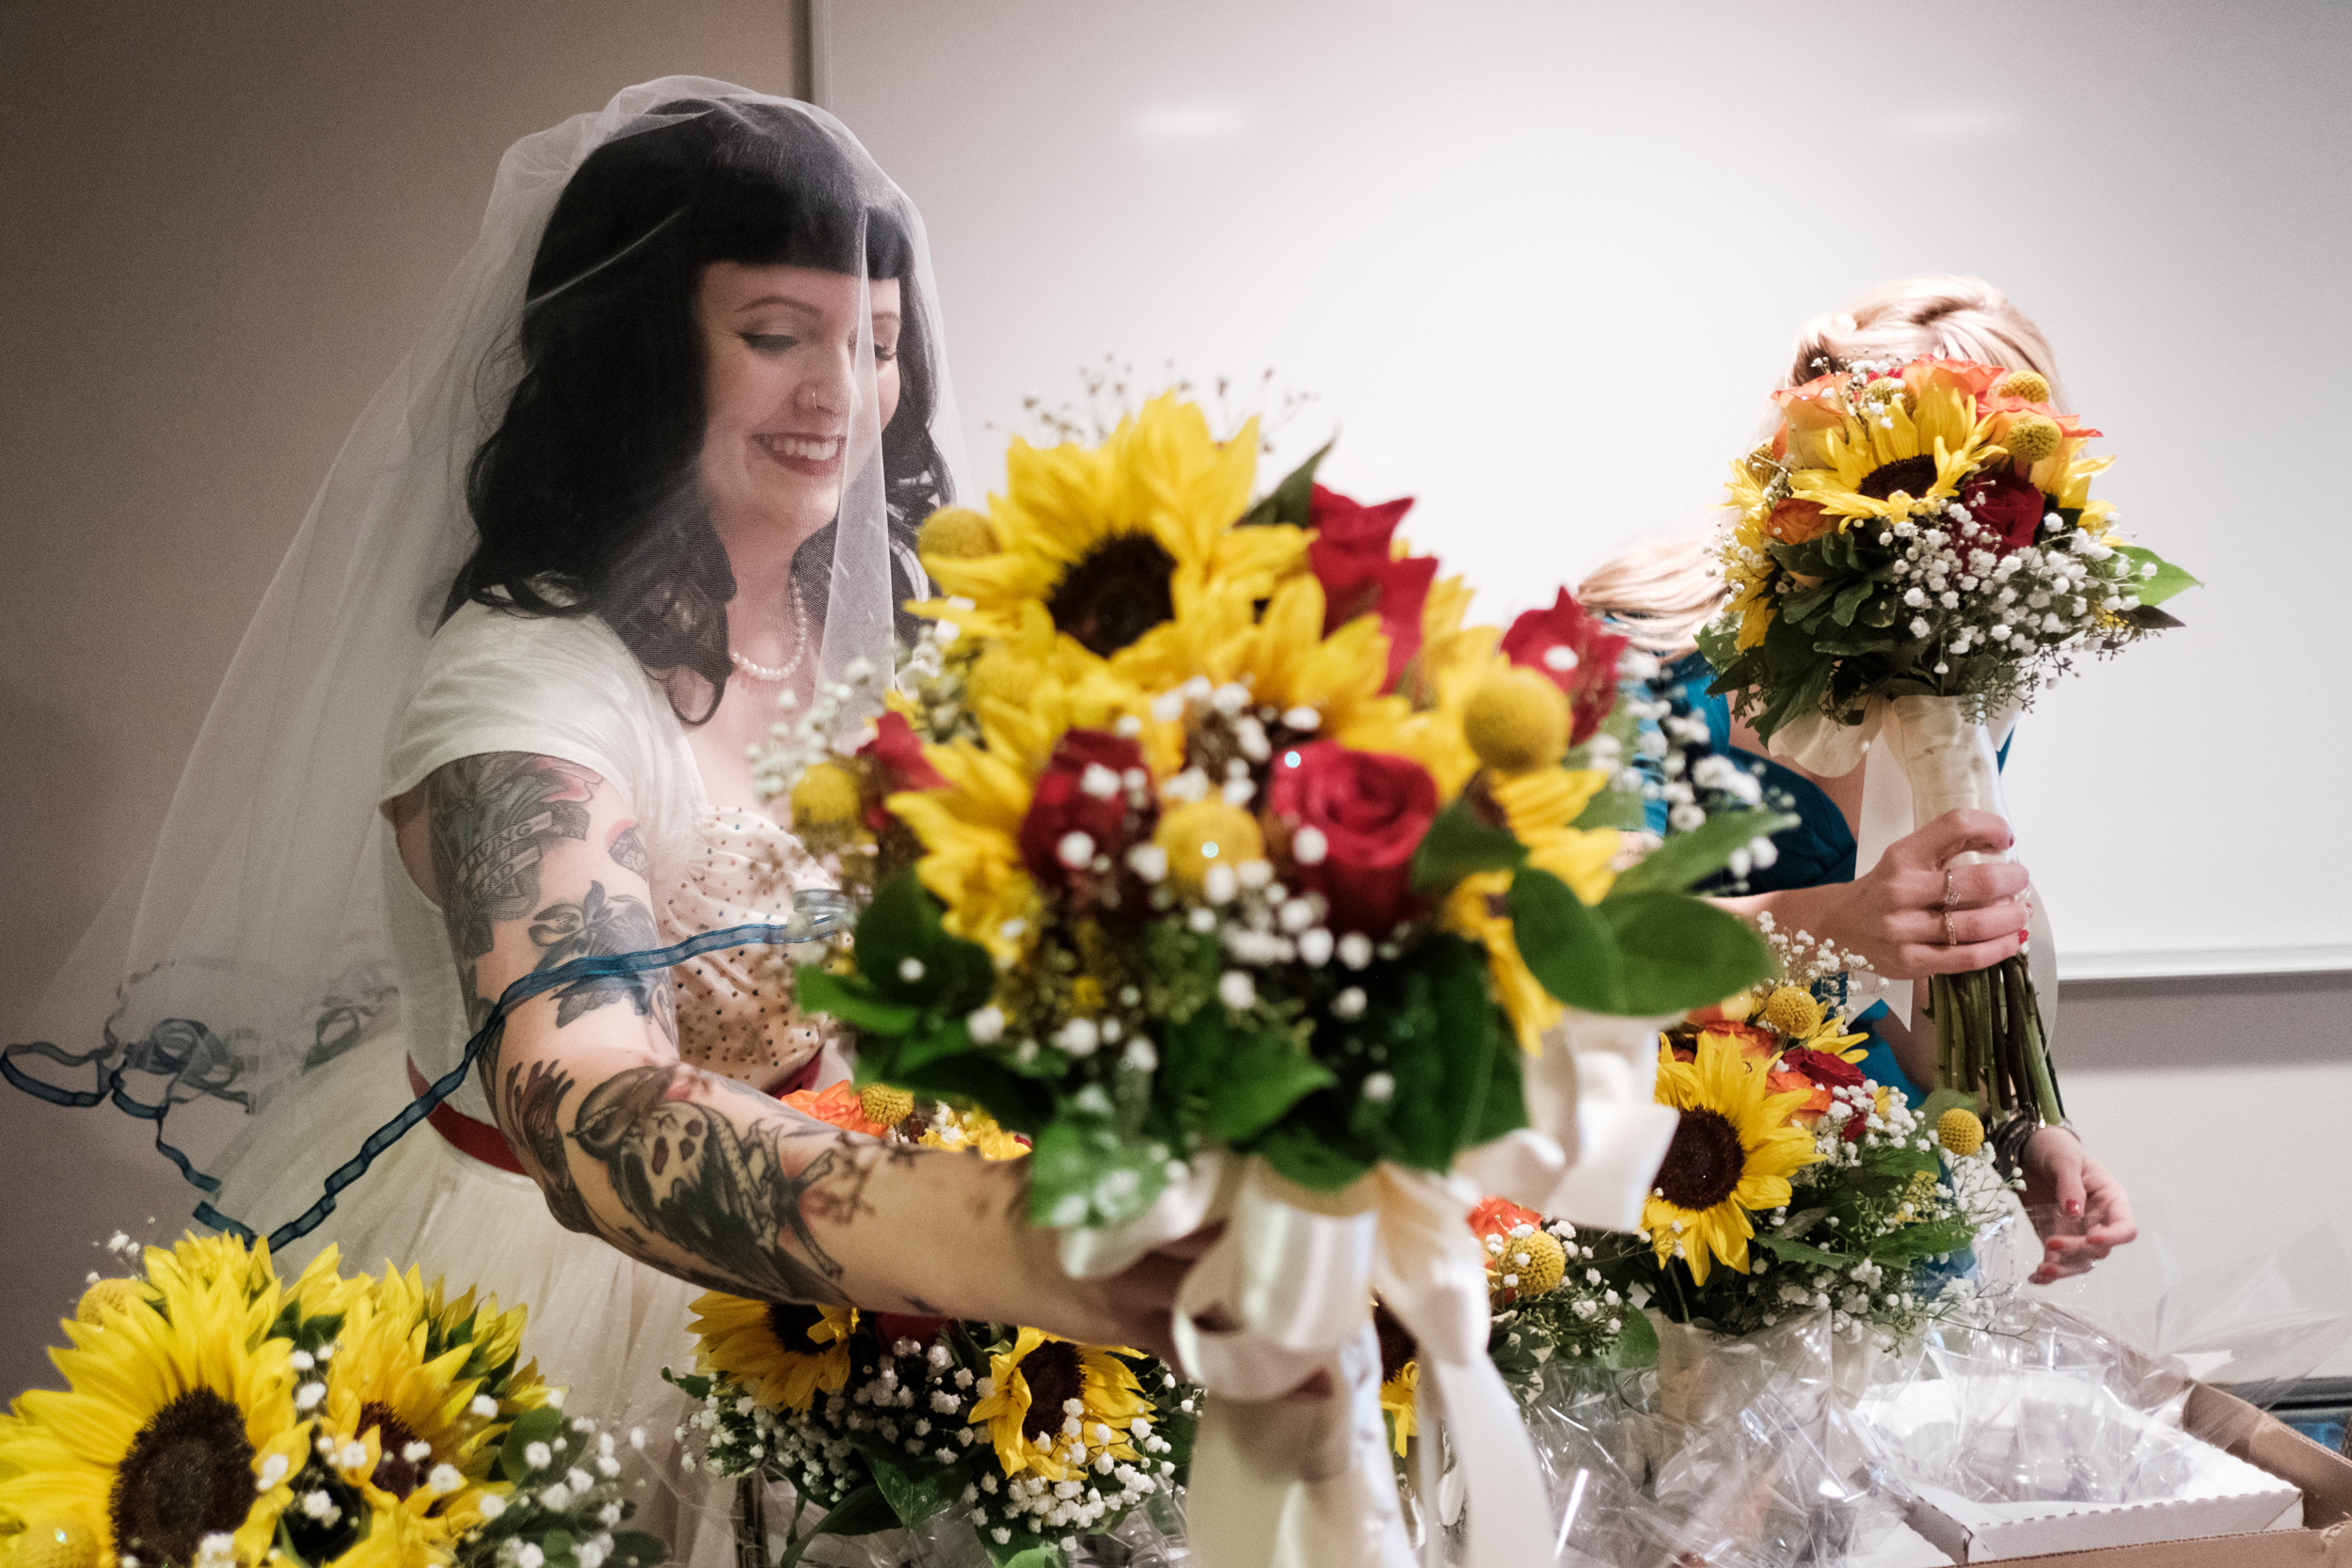 Christian & Sarah wedding photography by Brian milo-148.jpg